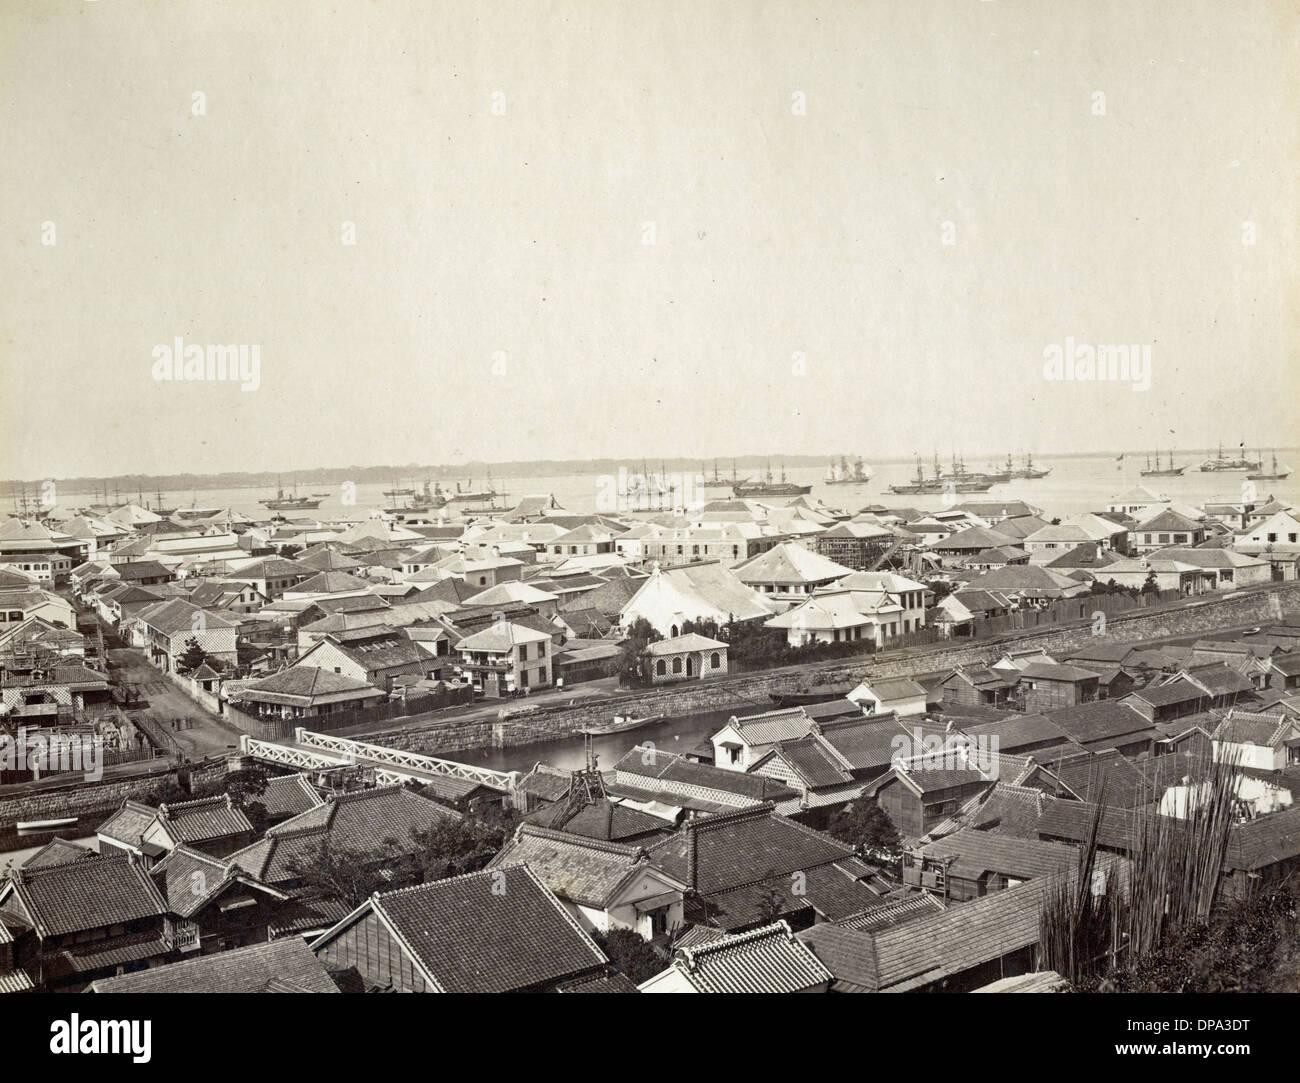 Japan - Floyd Photograph - Stock Image